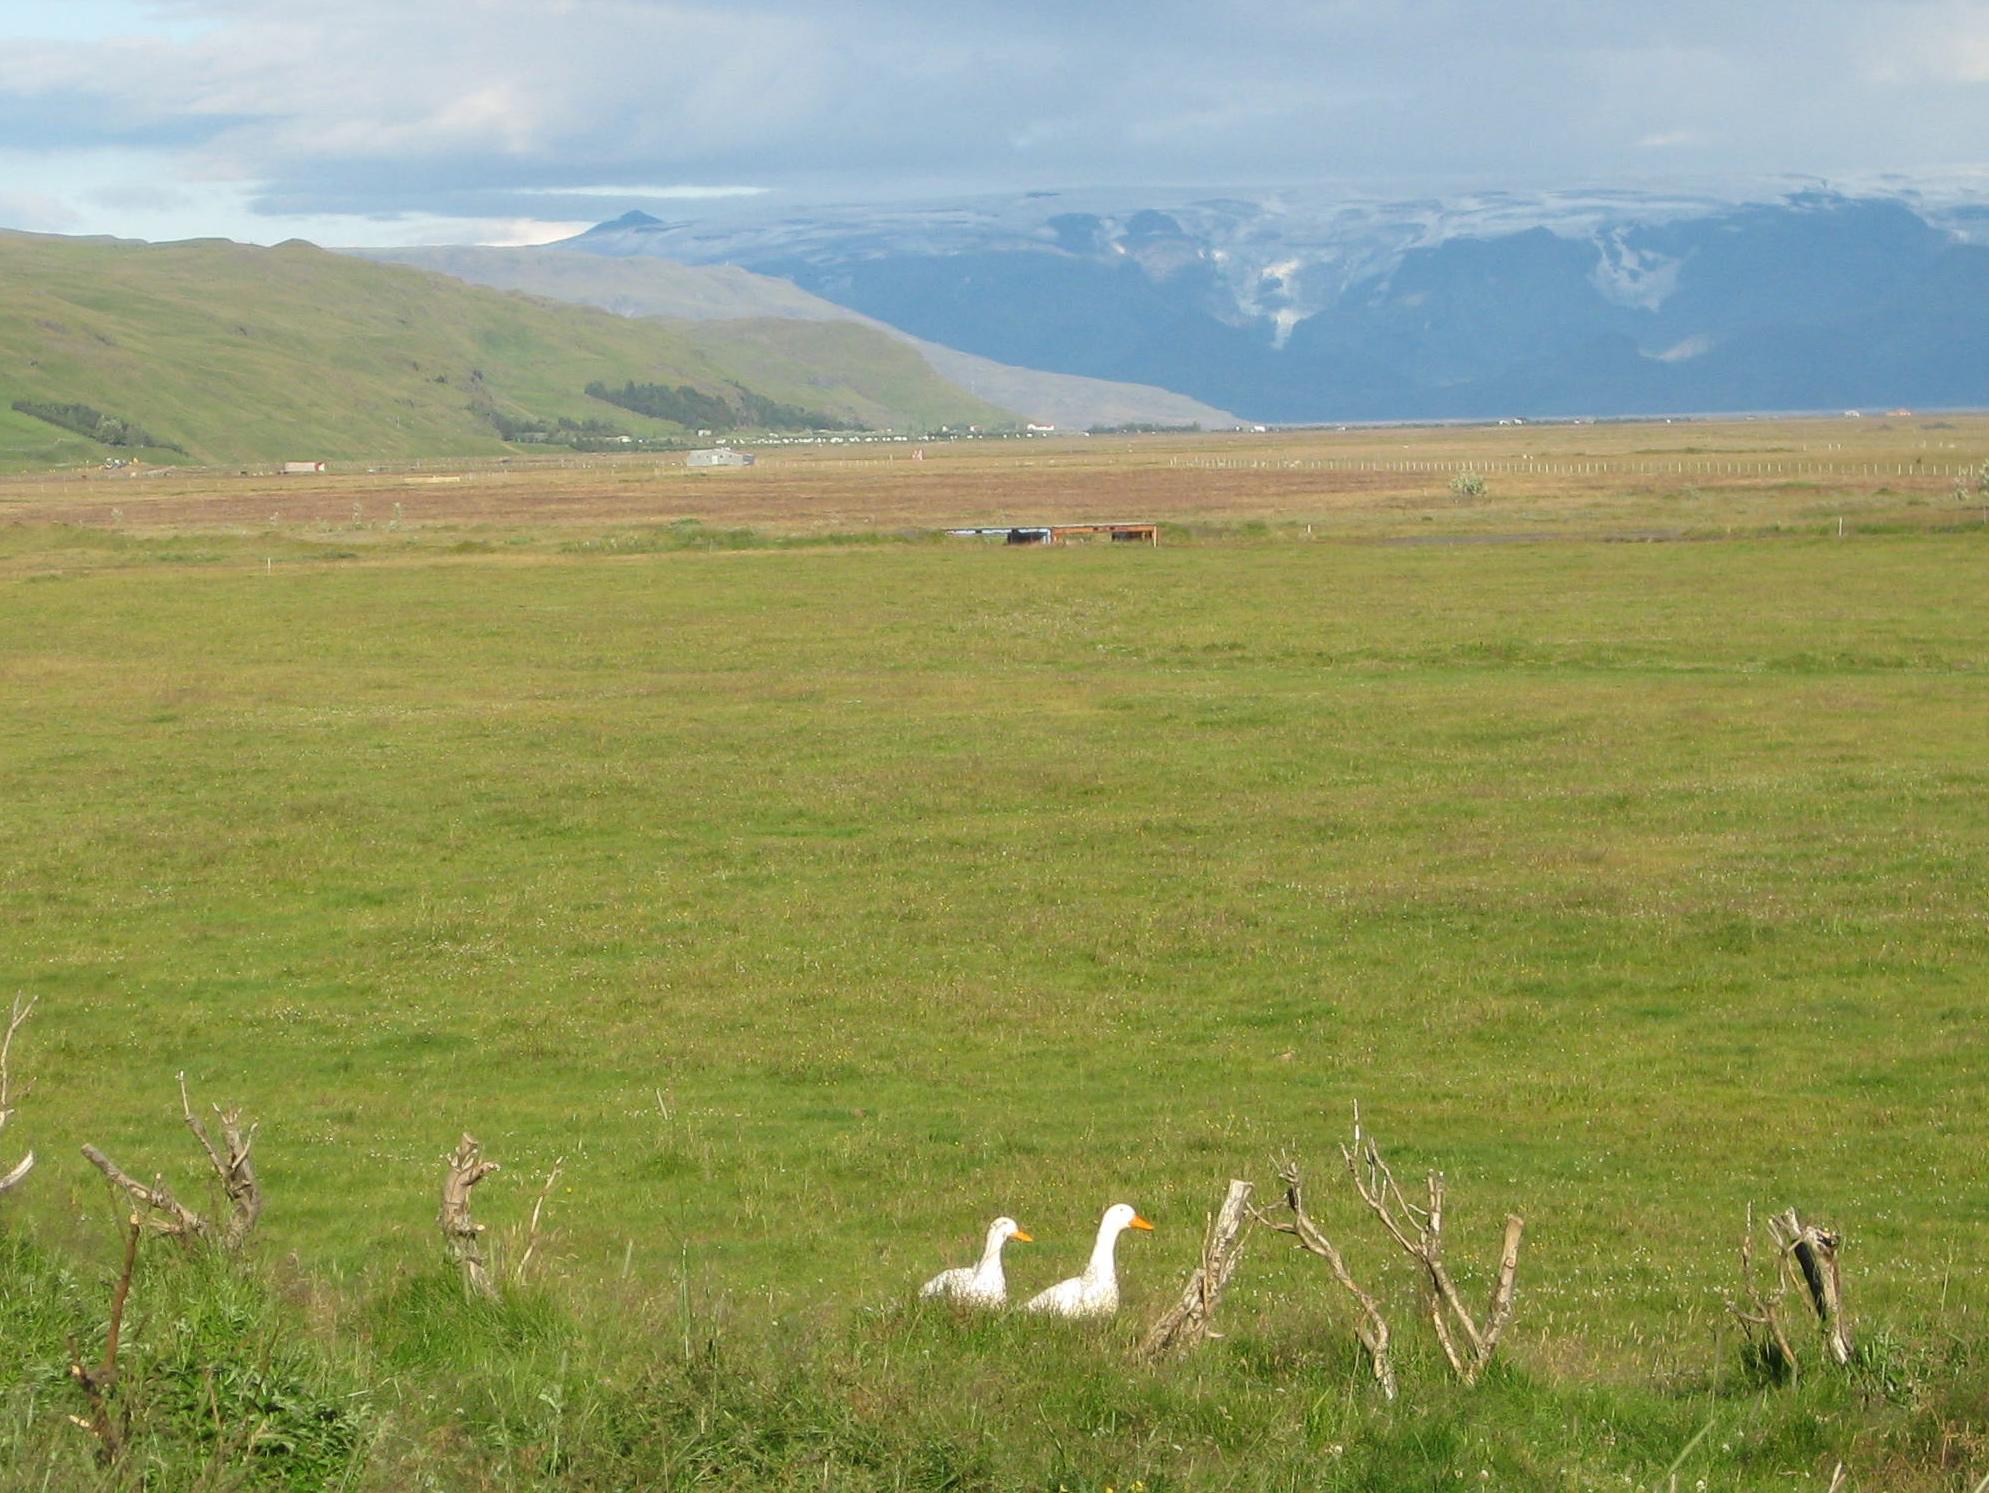 Ducks Iceland